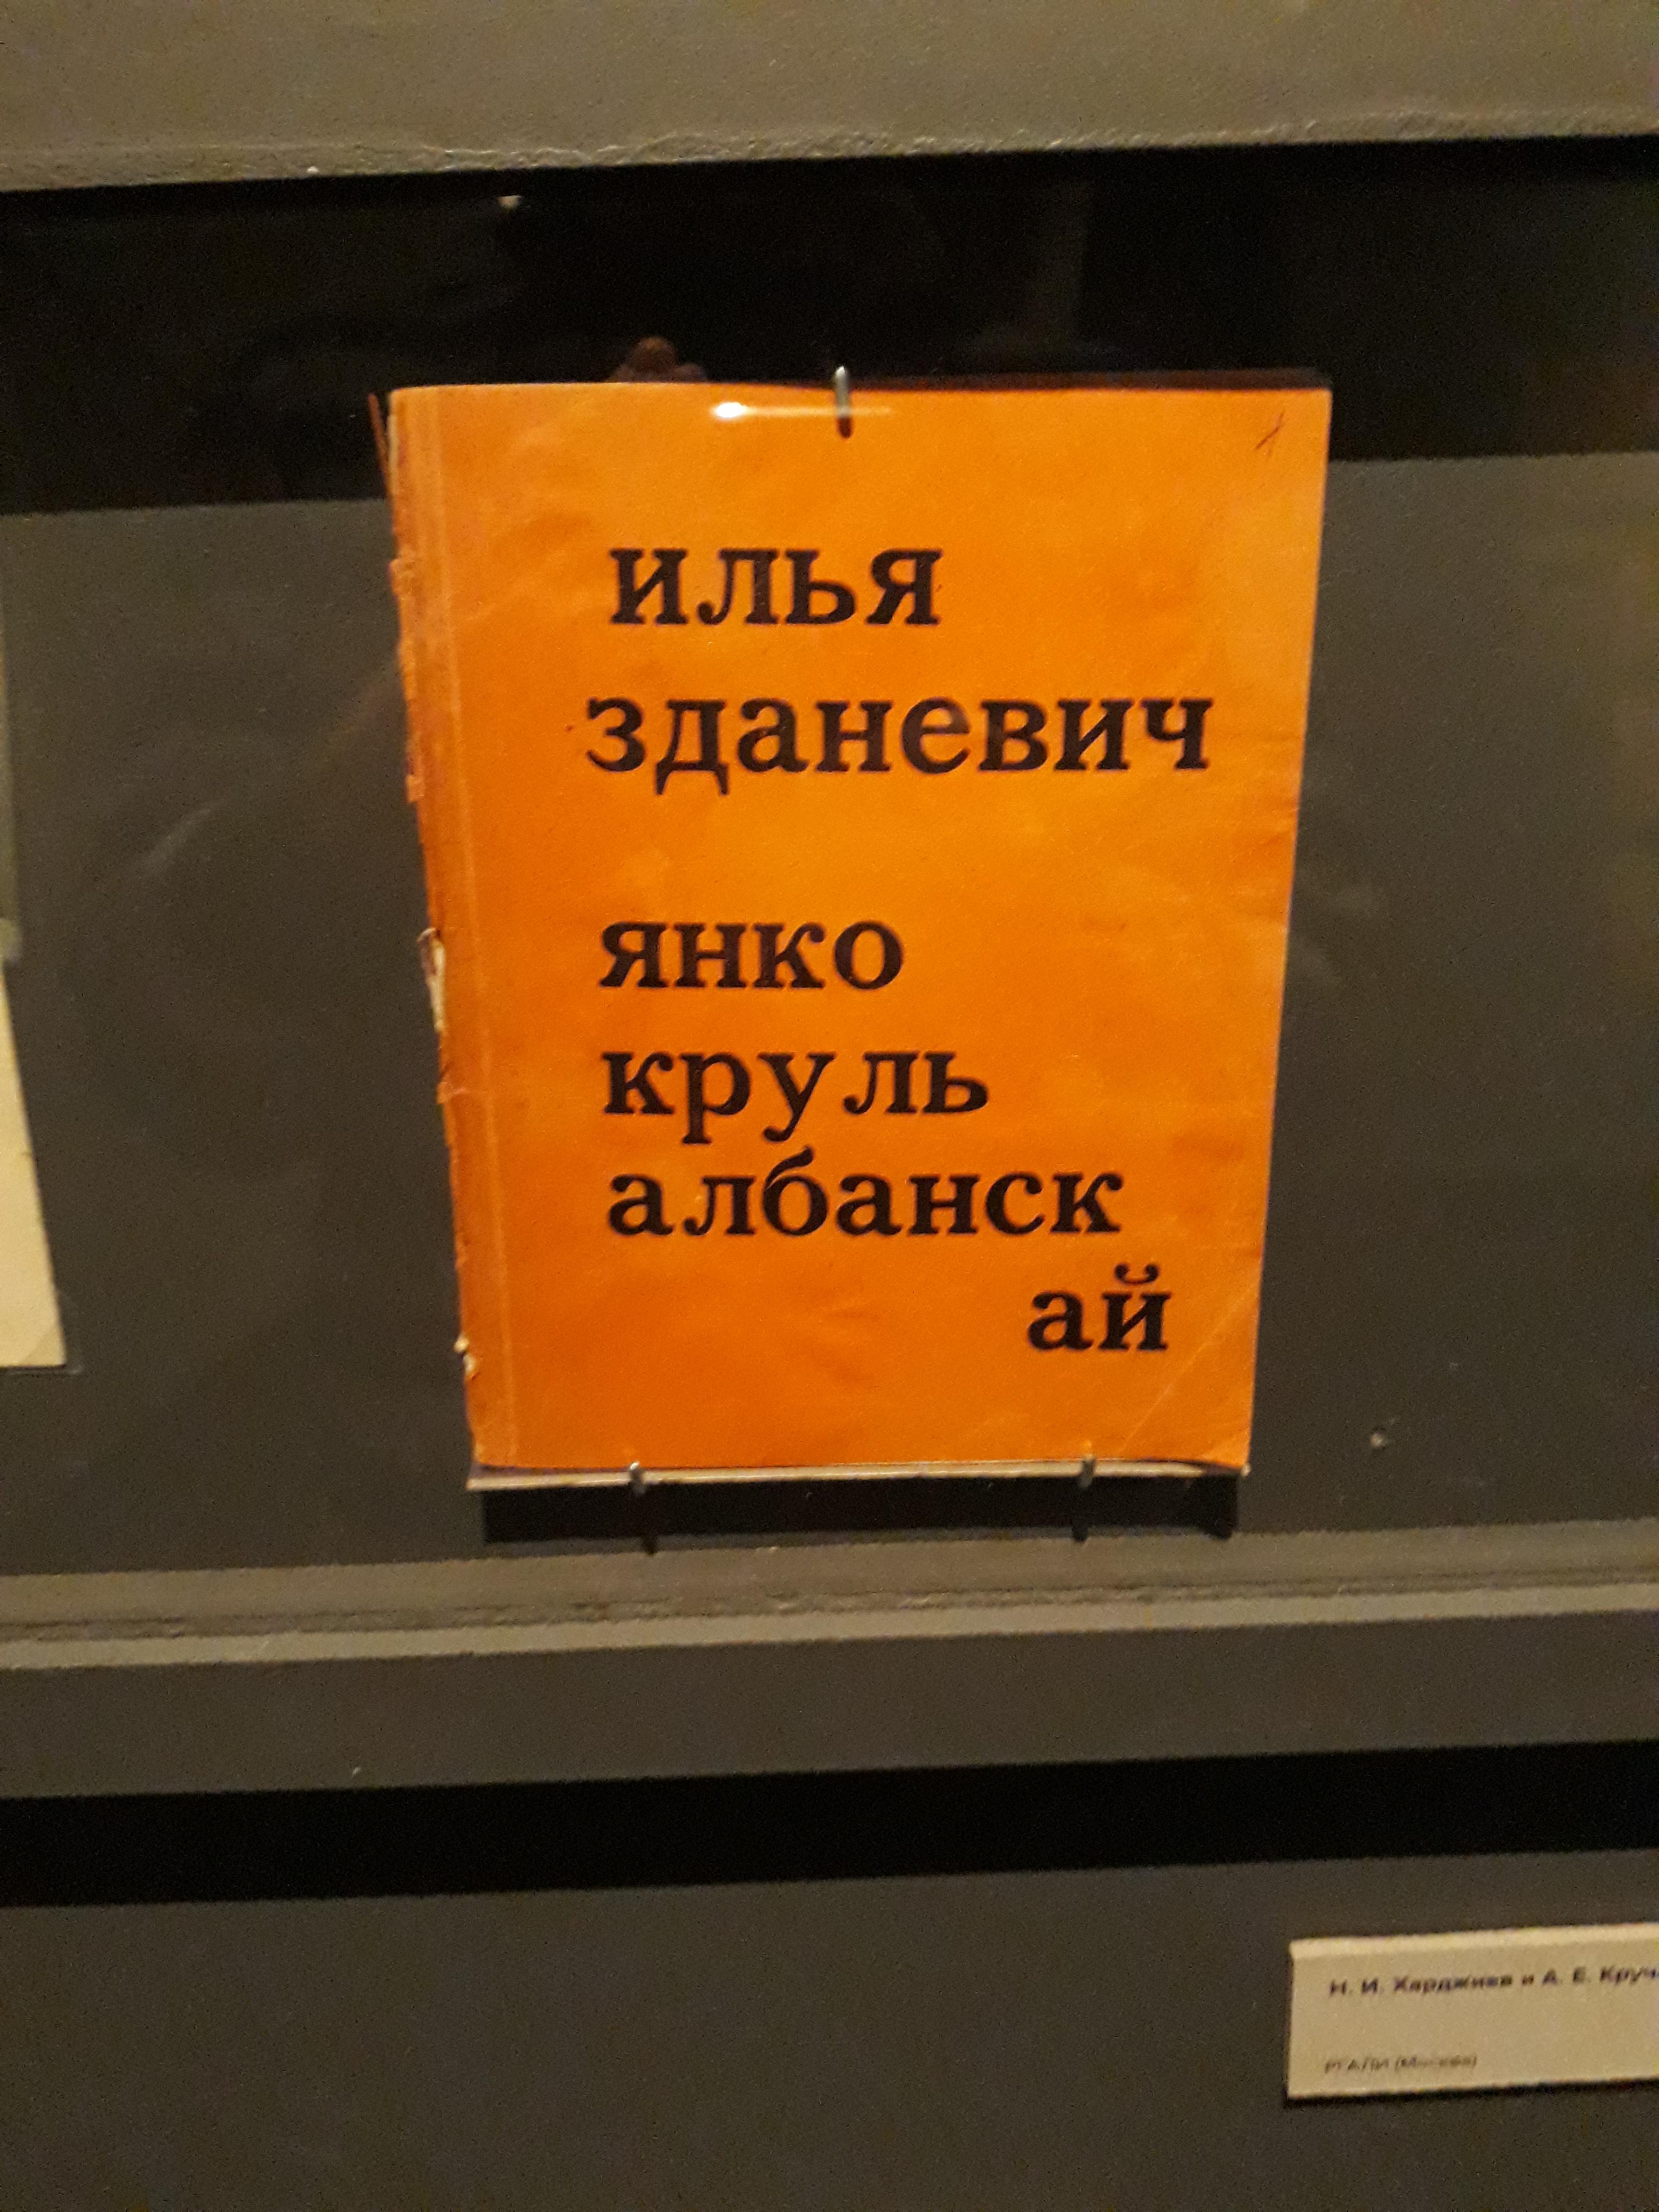 Харджиев албанский